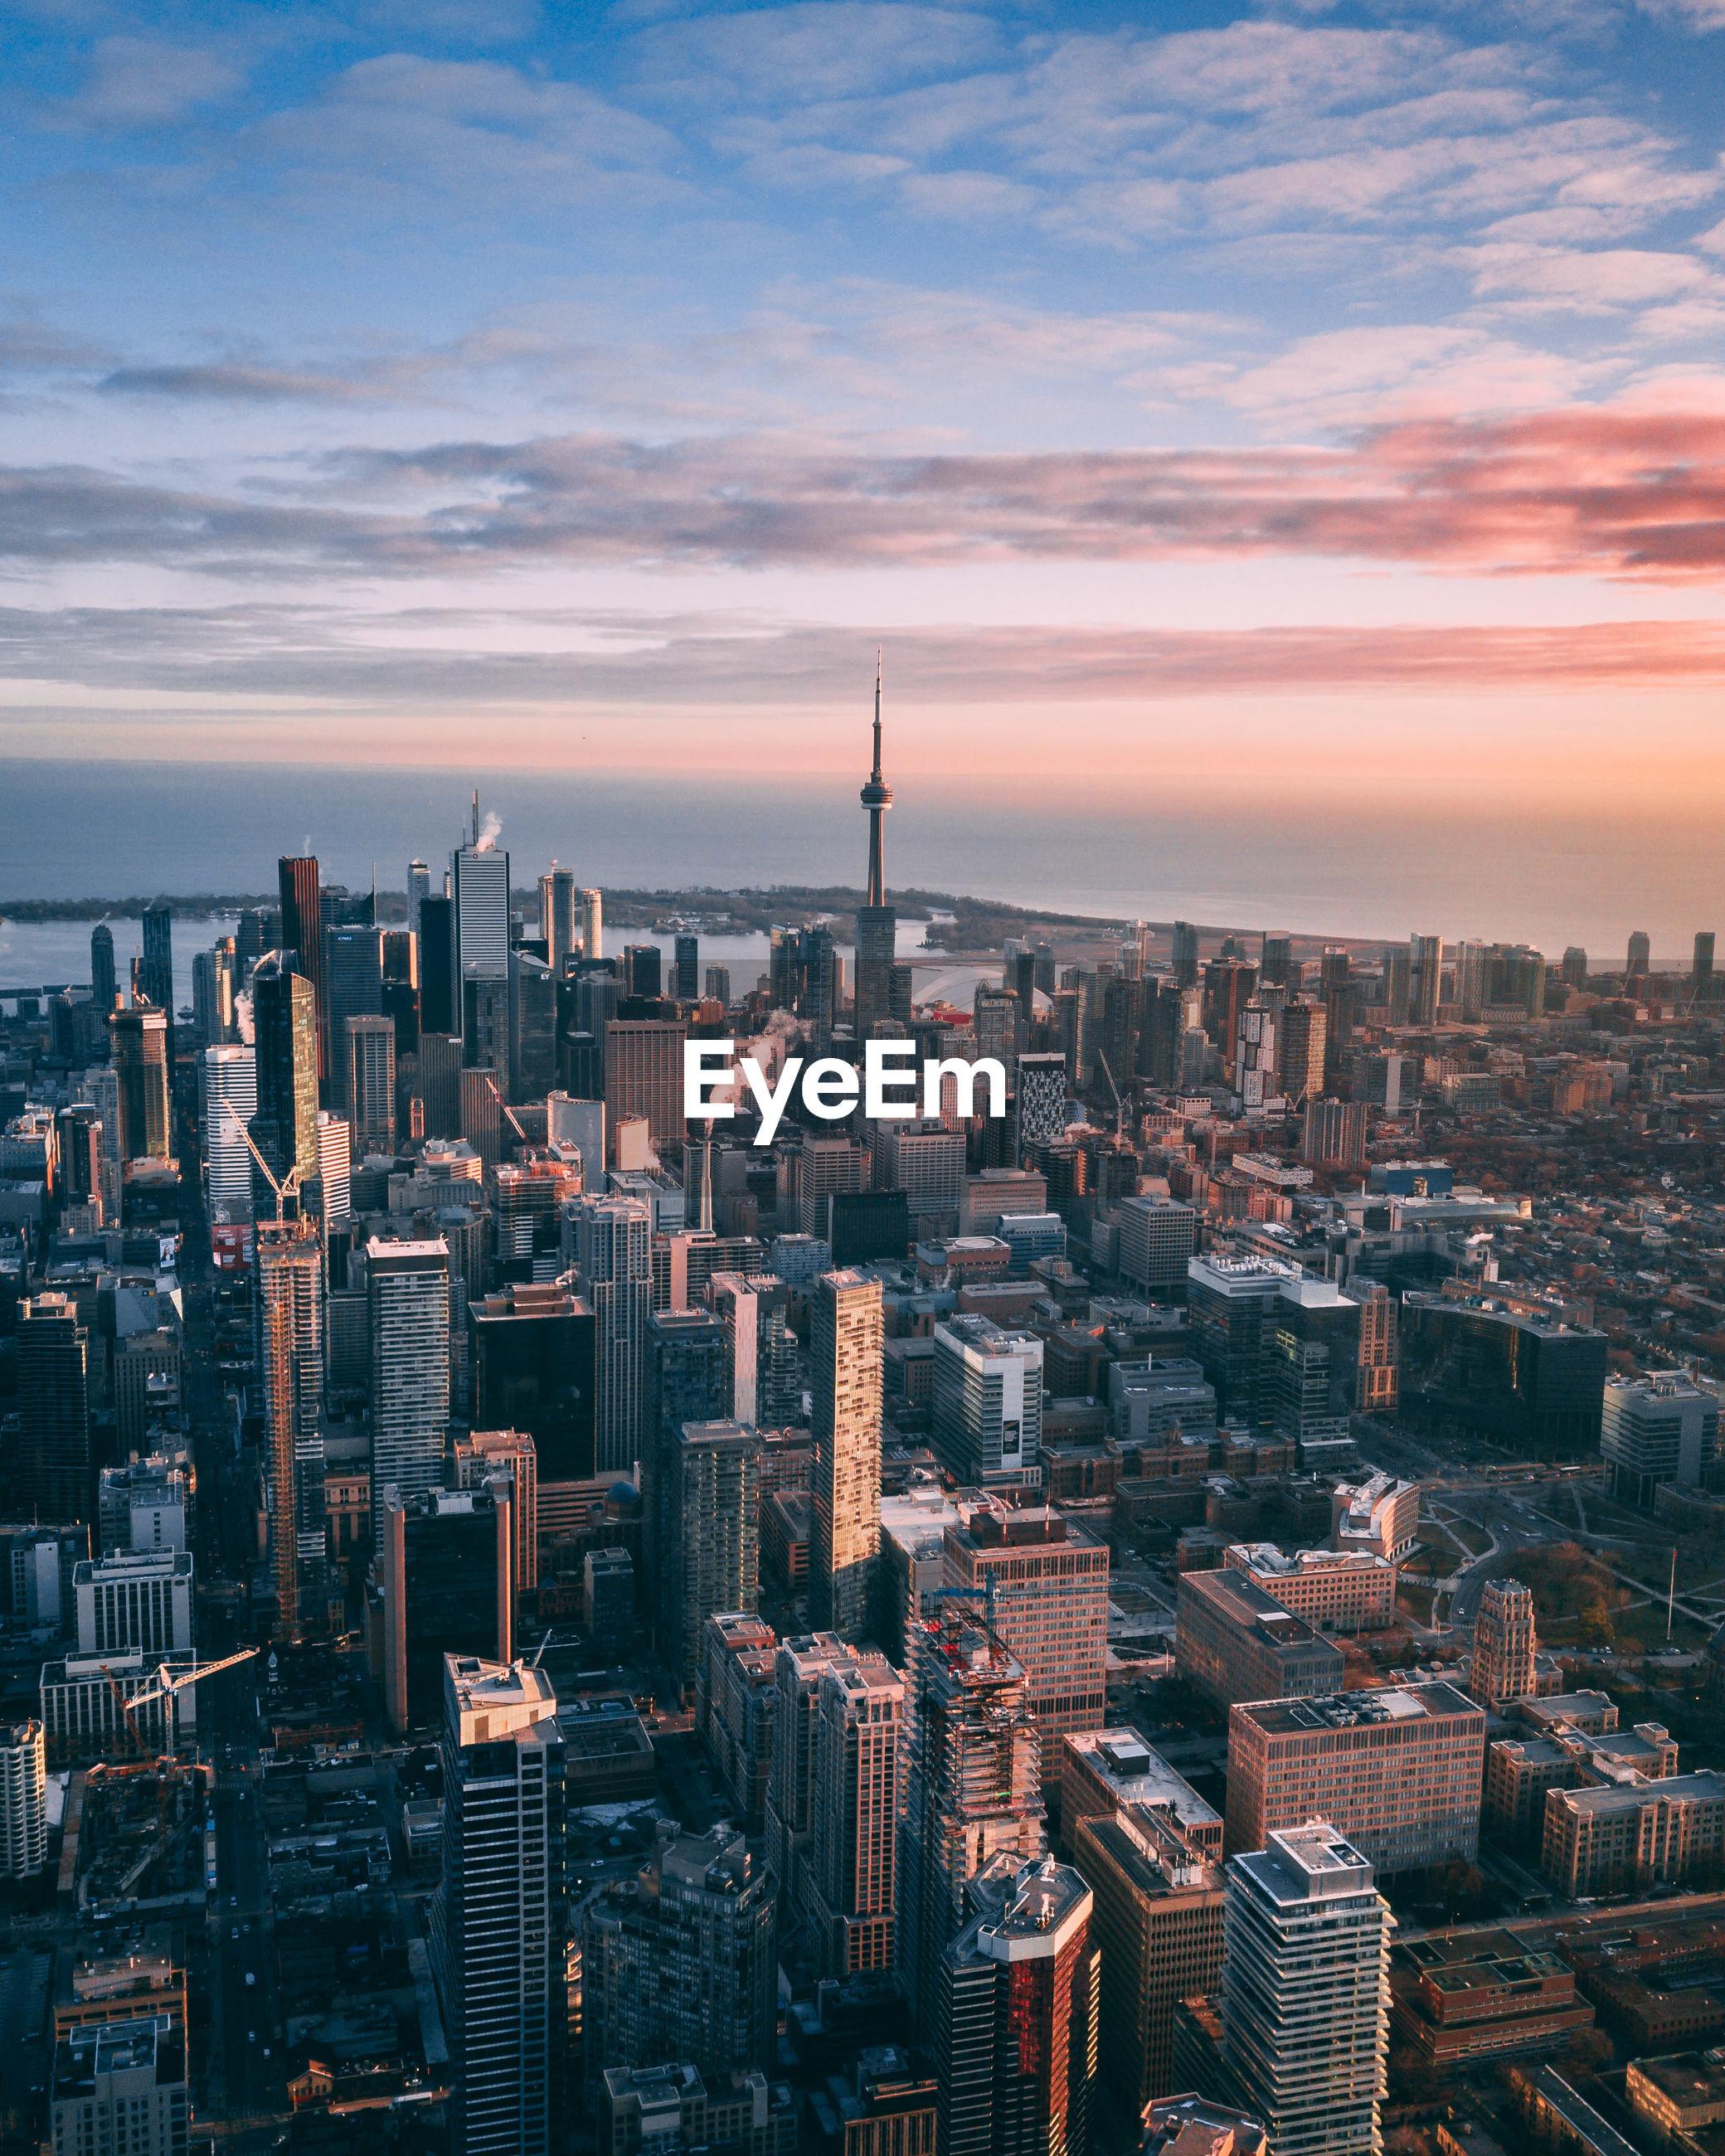 AERIAL VIEW OF BUILDINGS AGAINST CLOUDY SKY